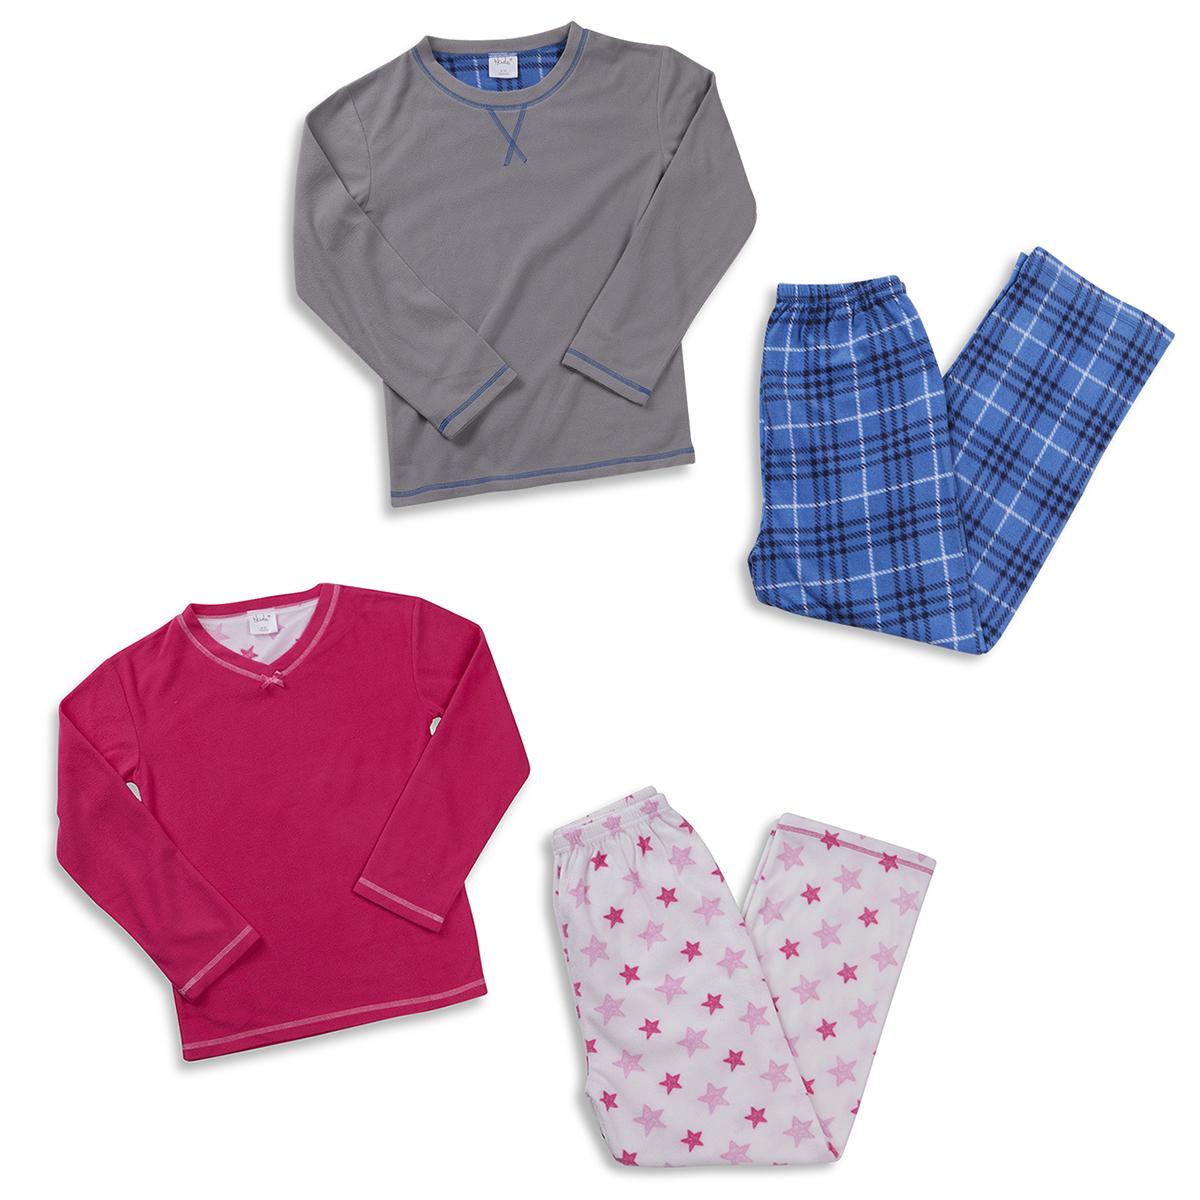 a972197a9 Details about Kids Micro Fleece Pyjama Set Top Bottoms Boys Girls Nightwear  Age 7-13 Years NEW